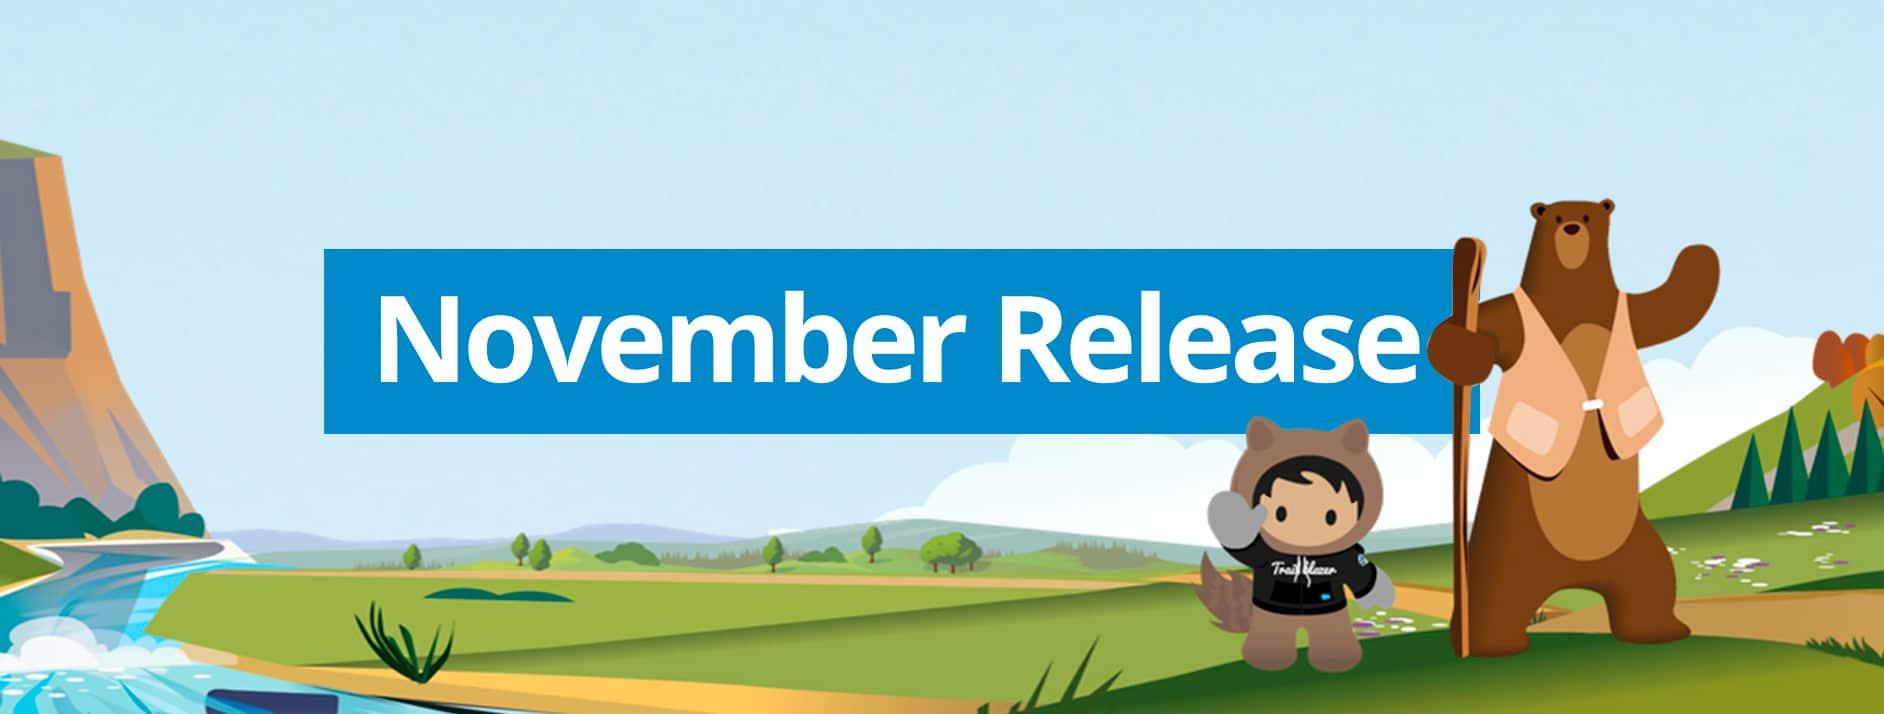 Release Nétive VMS november